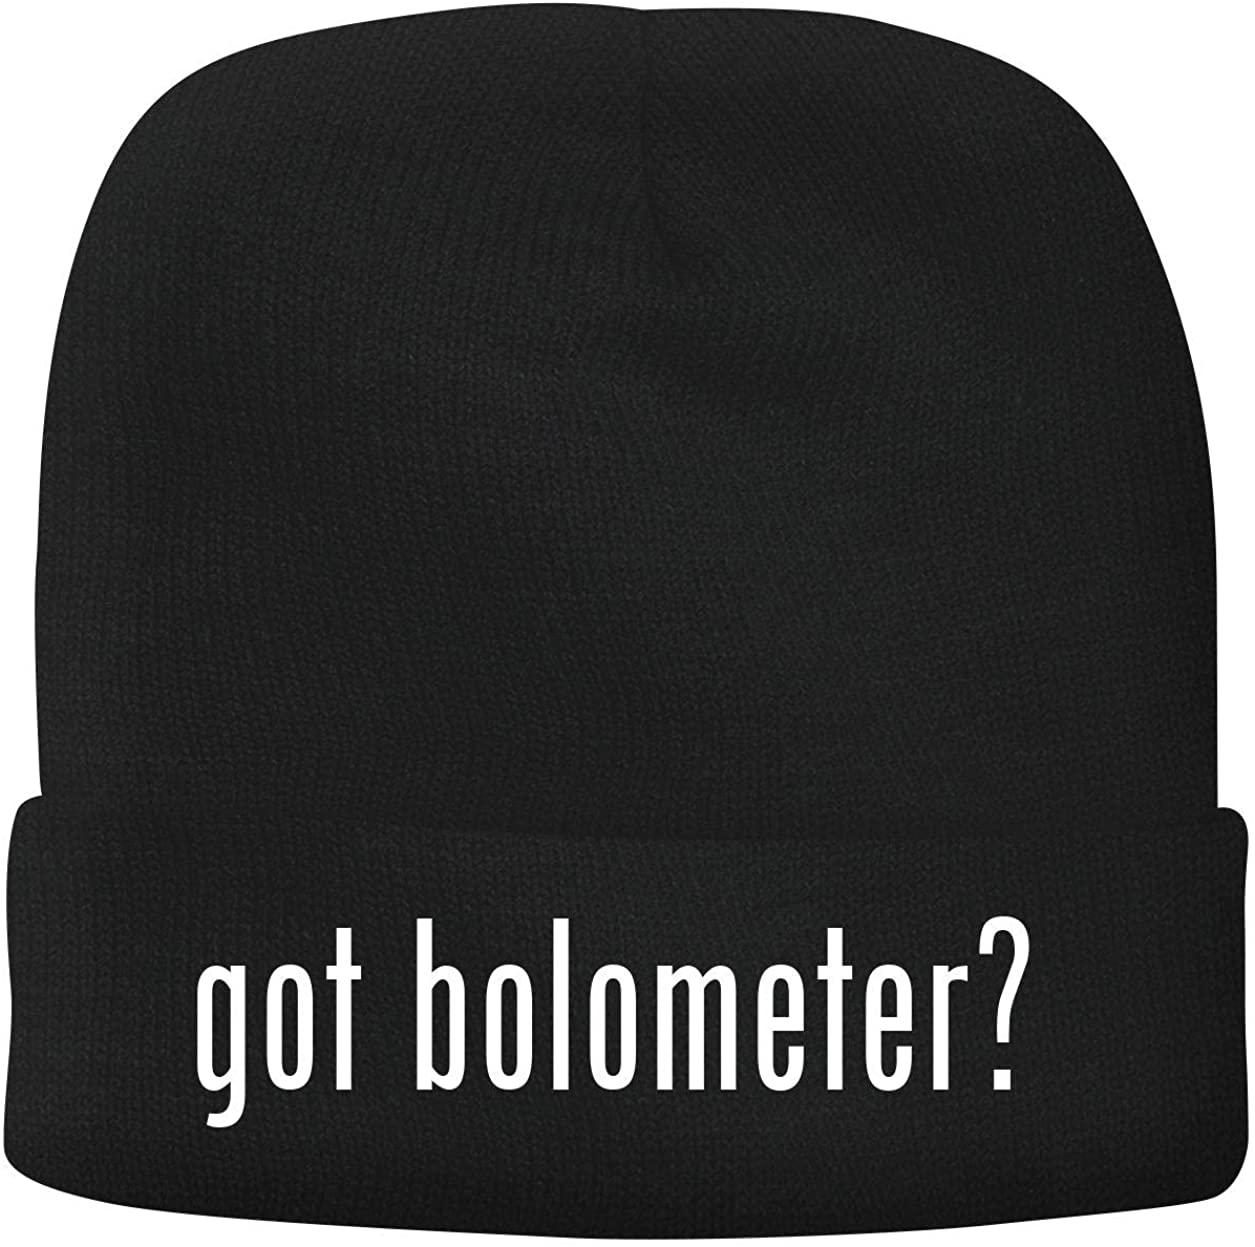 BH Cool Designs got Bolometer? - Men's Soft & Comfortable Beanie Hat Cap